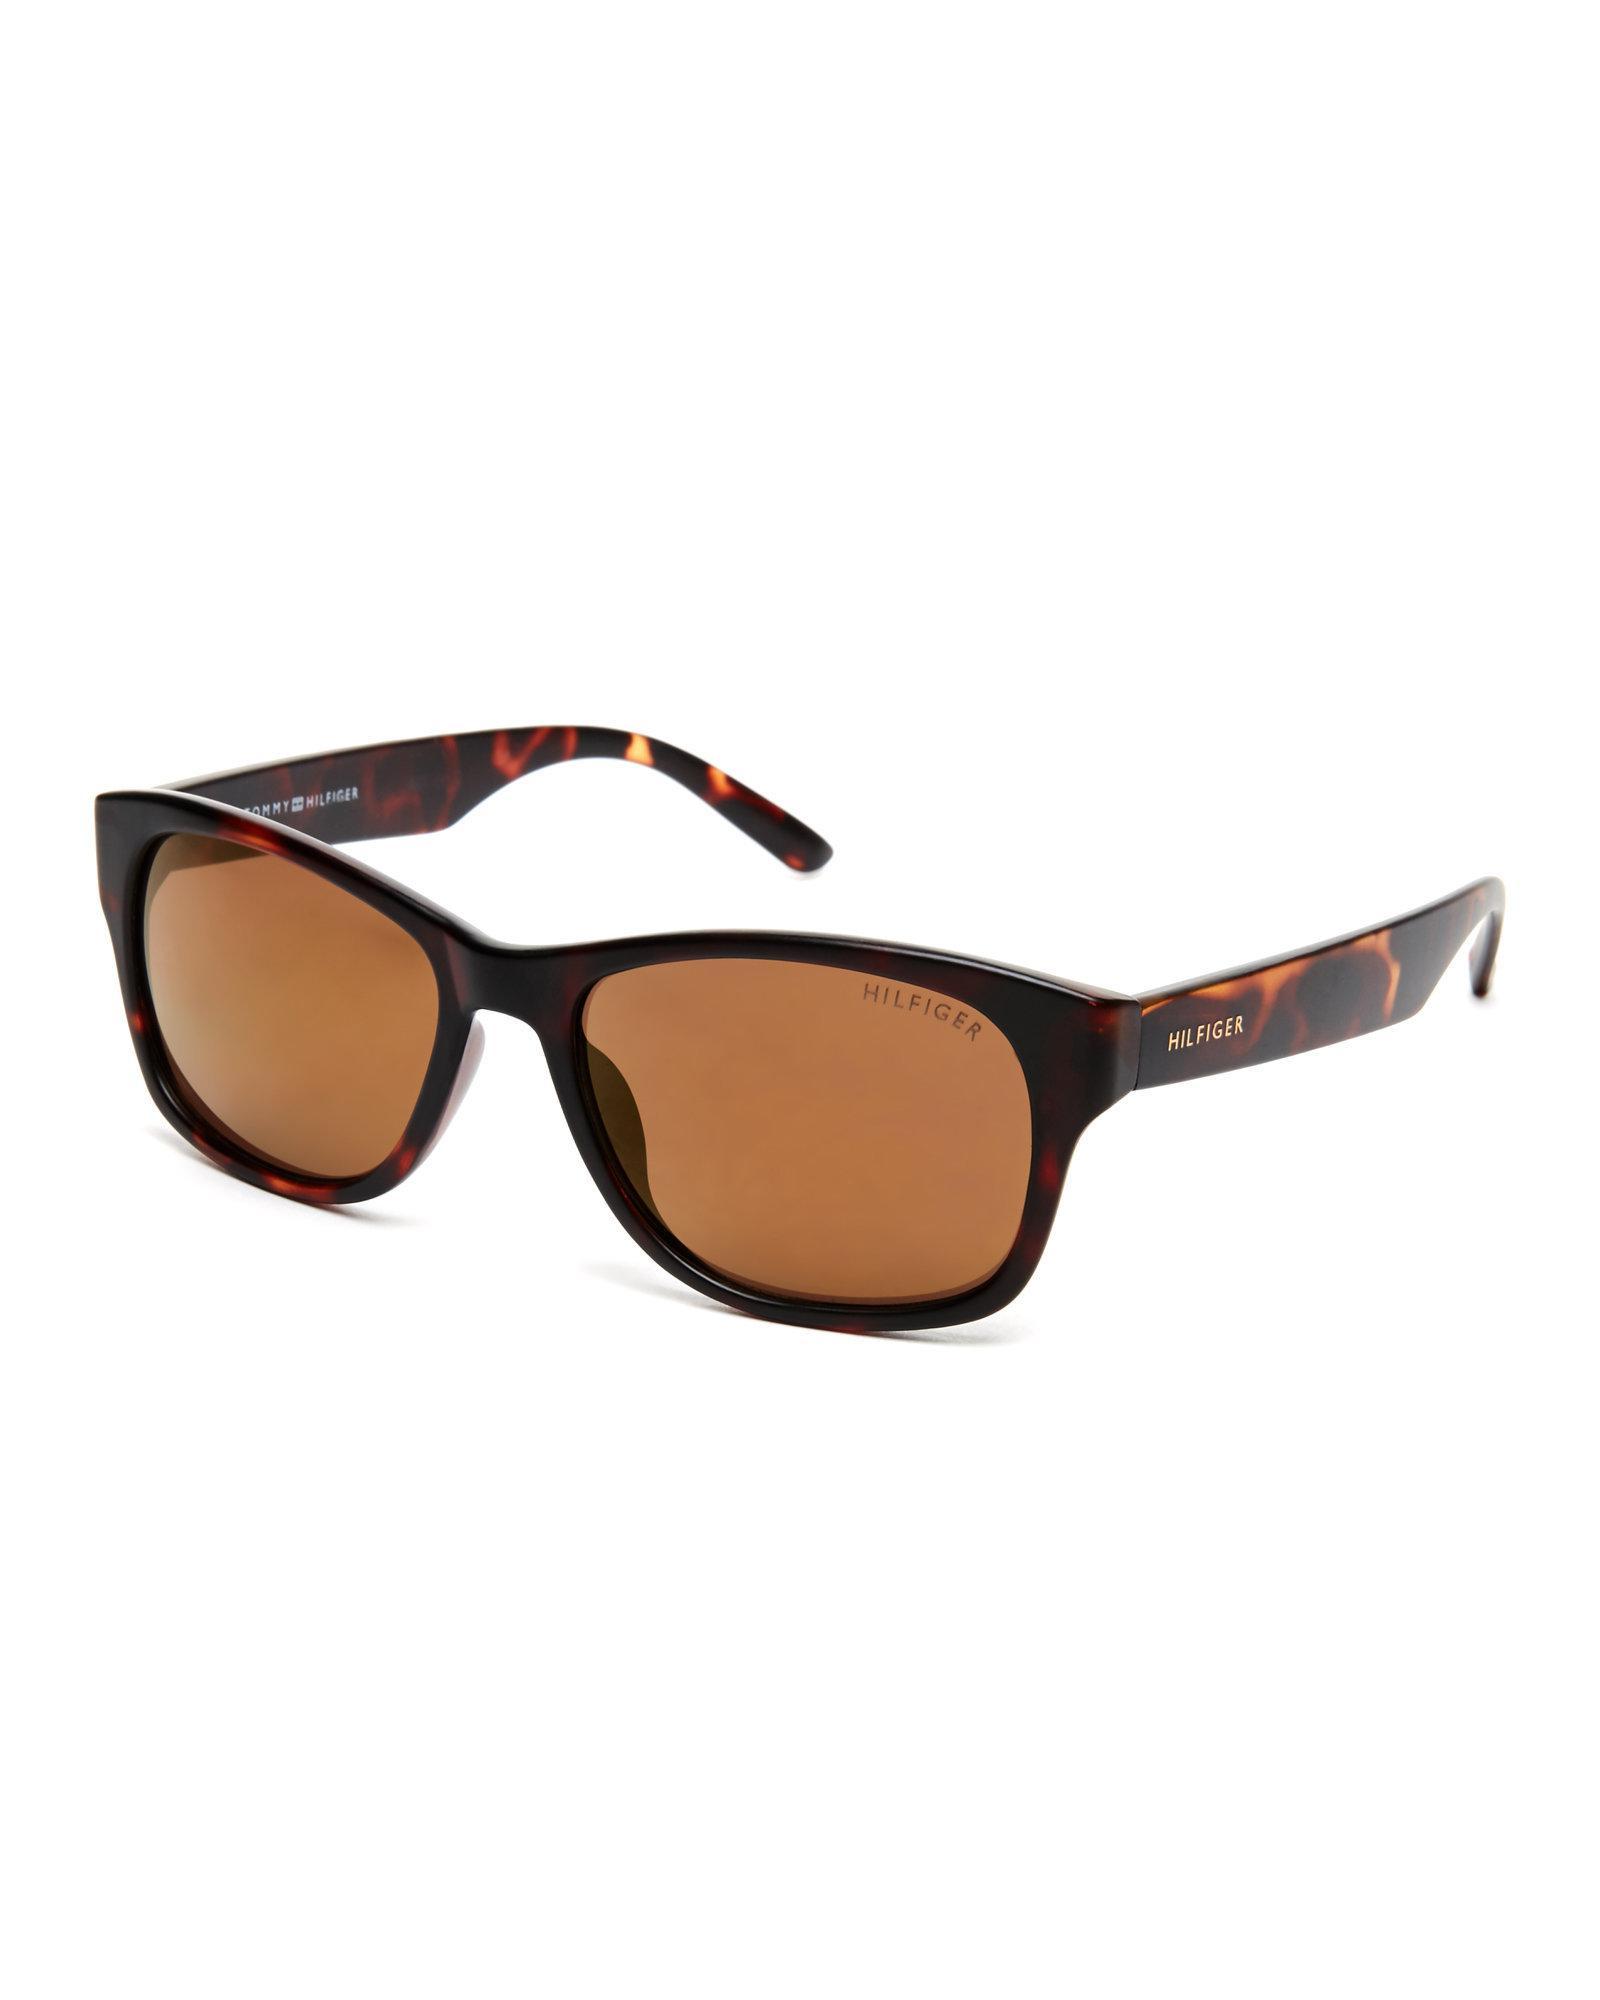 3183aed2b6a Tommy Hilfiger. Women s Brown Tortoiseshell-Look Leo Wayfarer Sunglasses